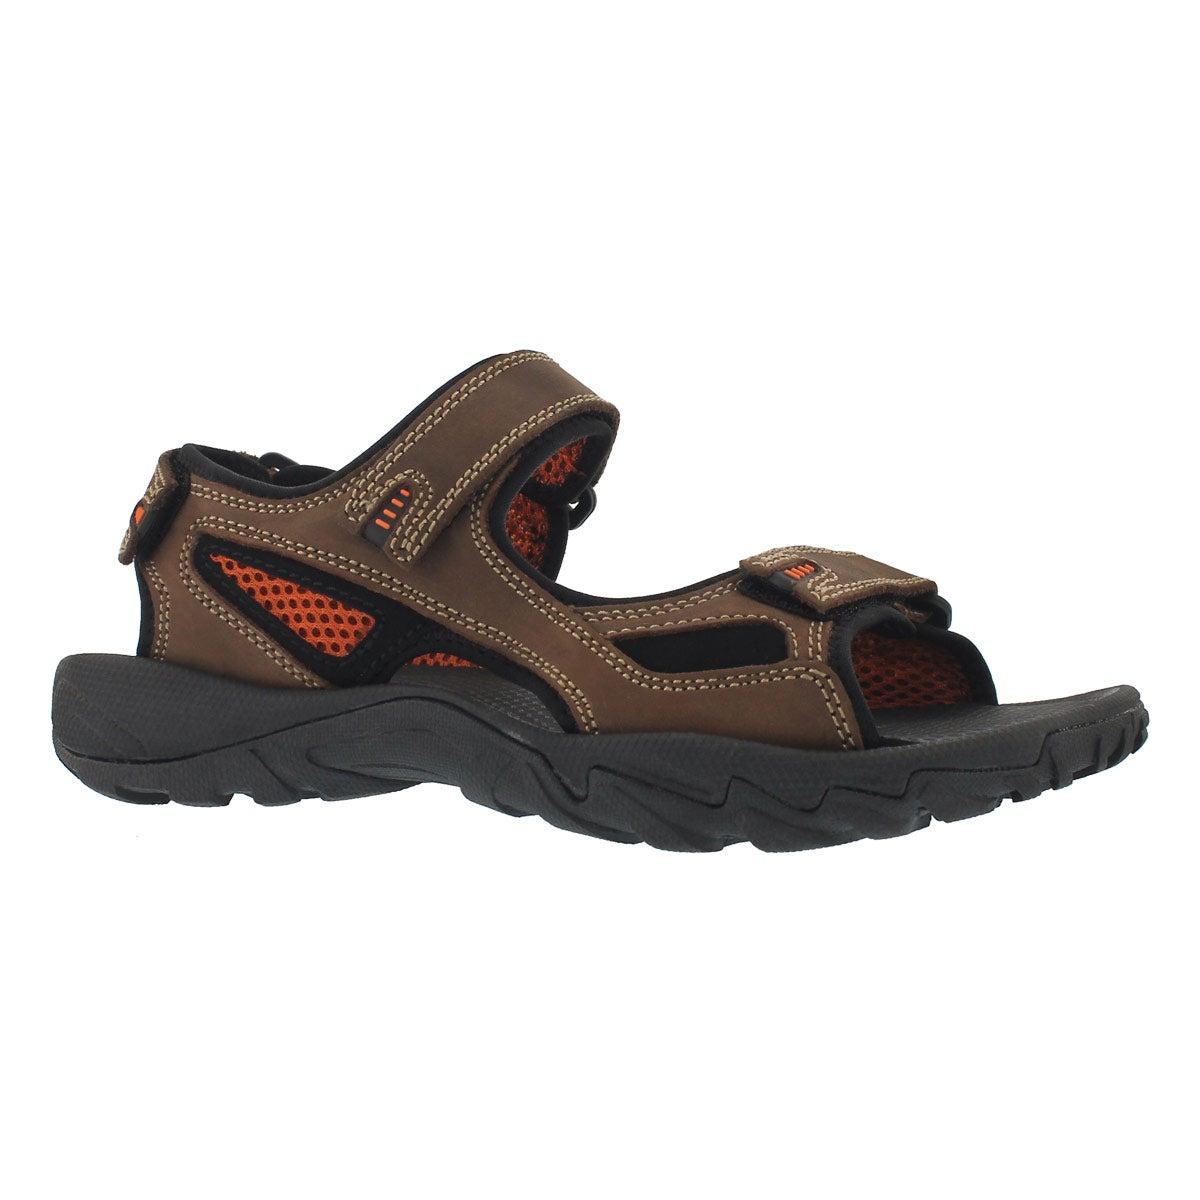 Men's LUCIUS 2 brown 3 strap sandal